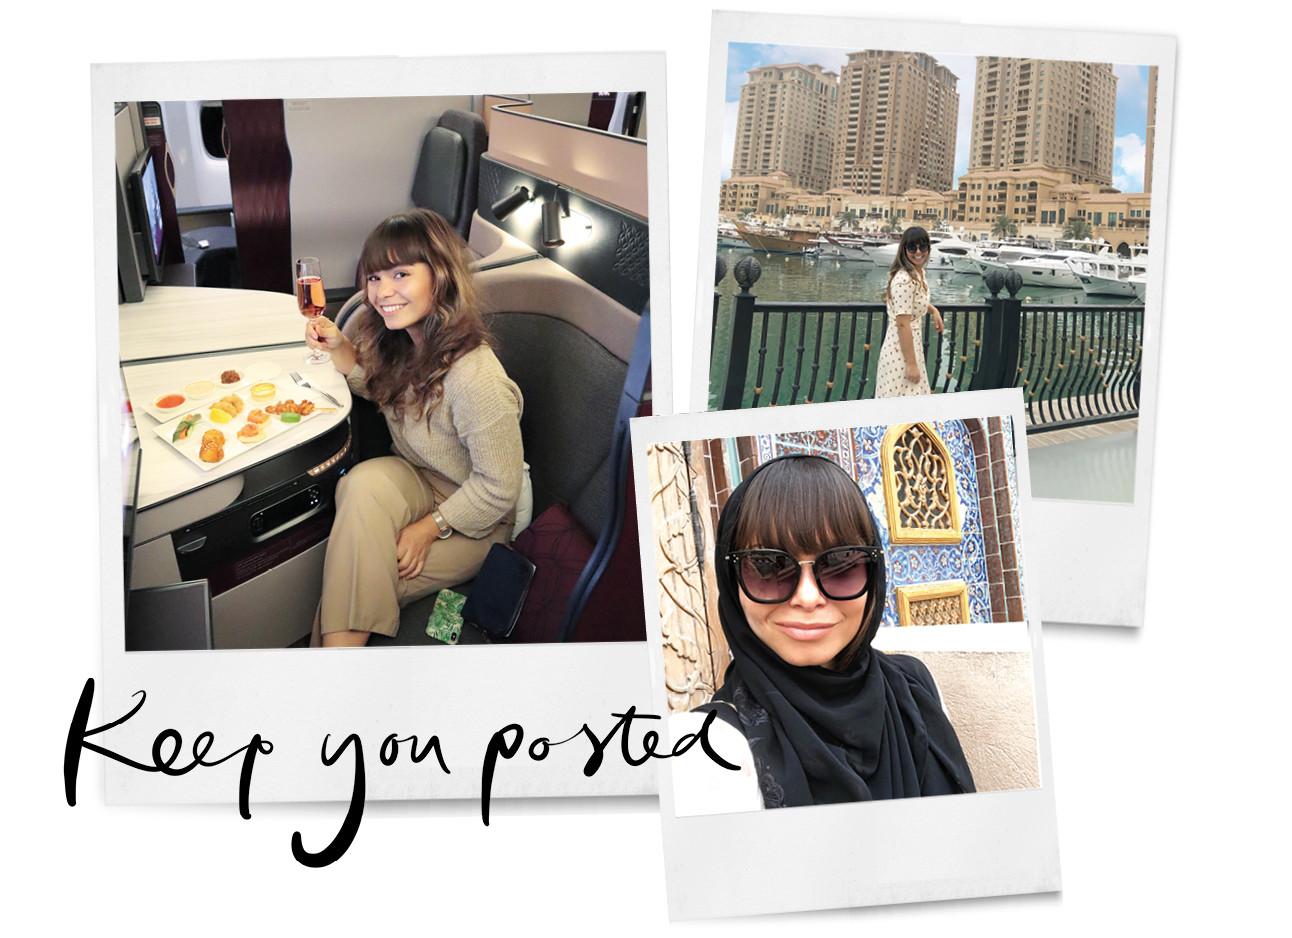 Kiki duren in het vliegtuig van qatar airways, sightseeing en met een hoofddoek en bril op, keep you posted